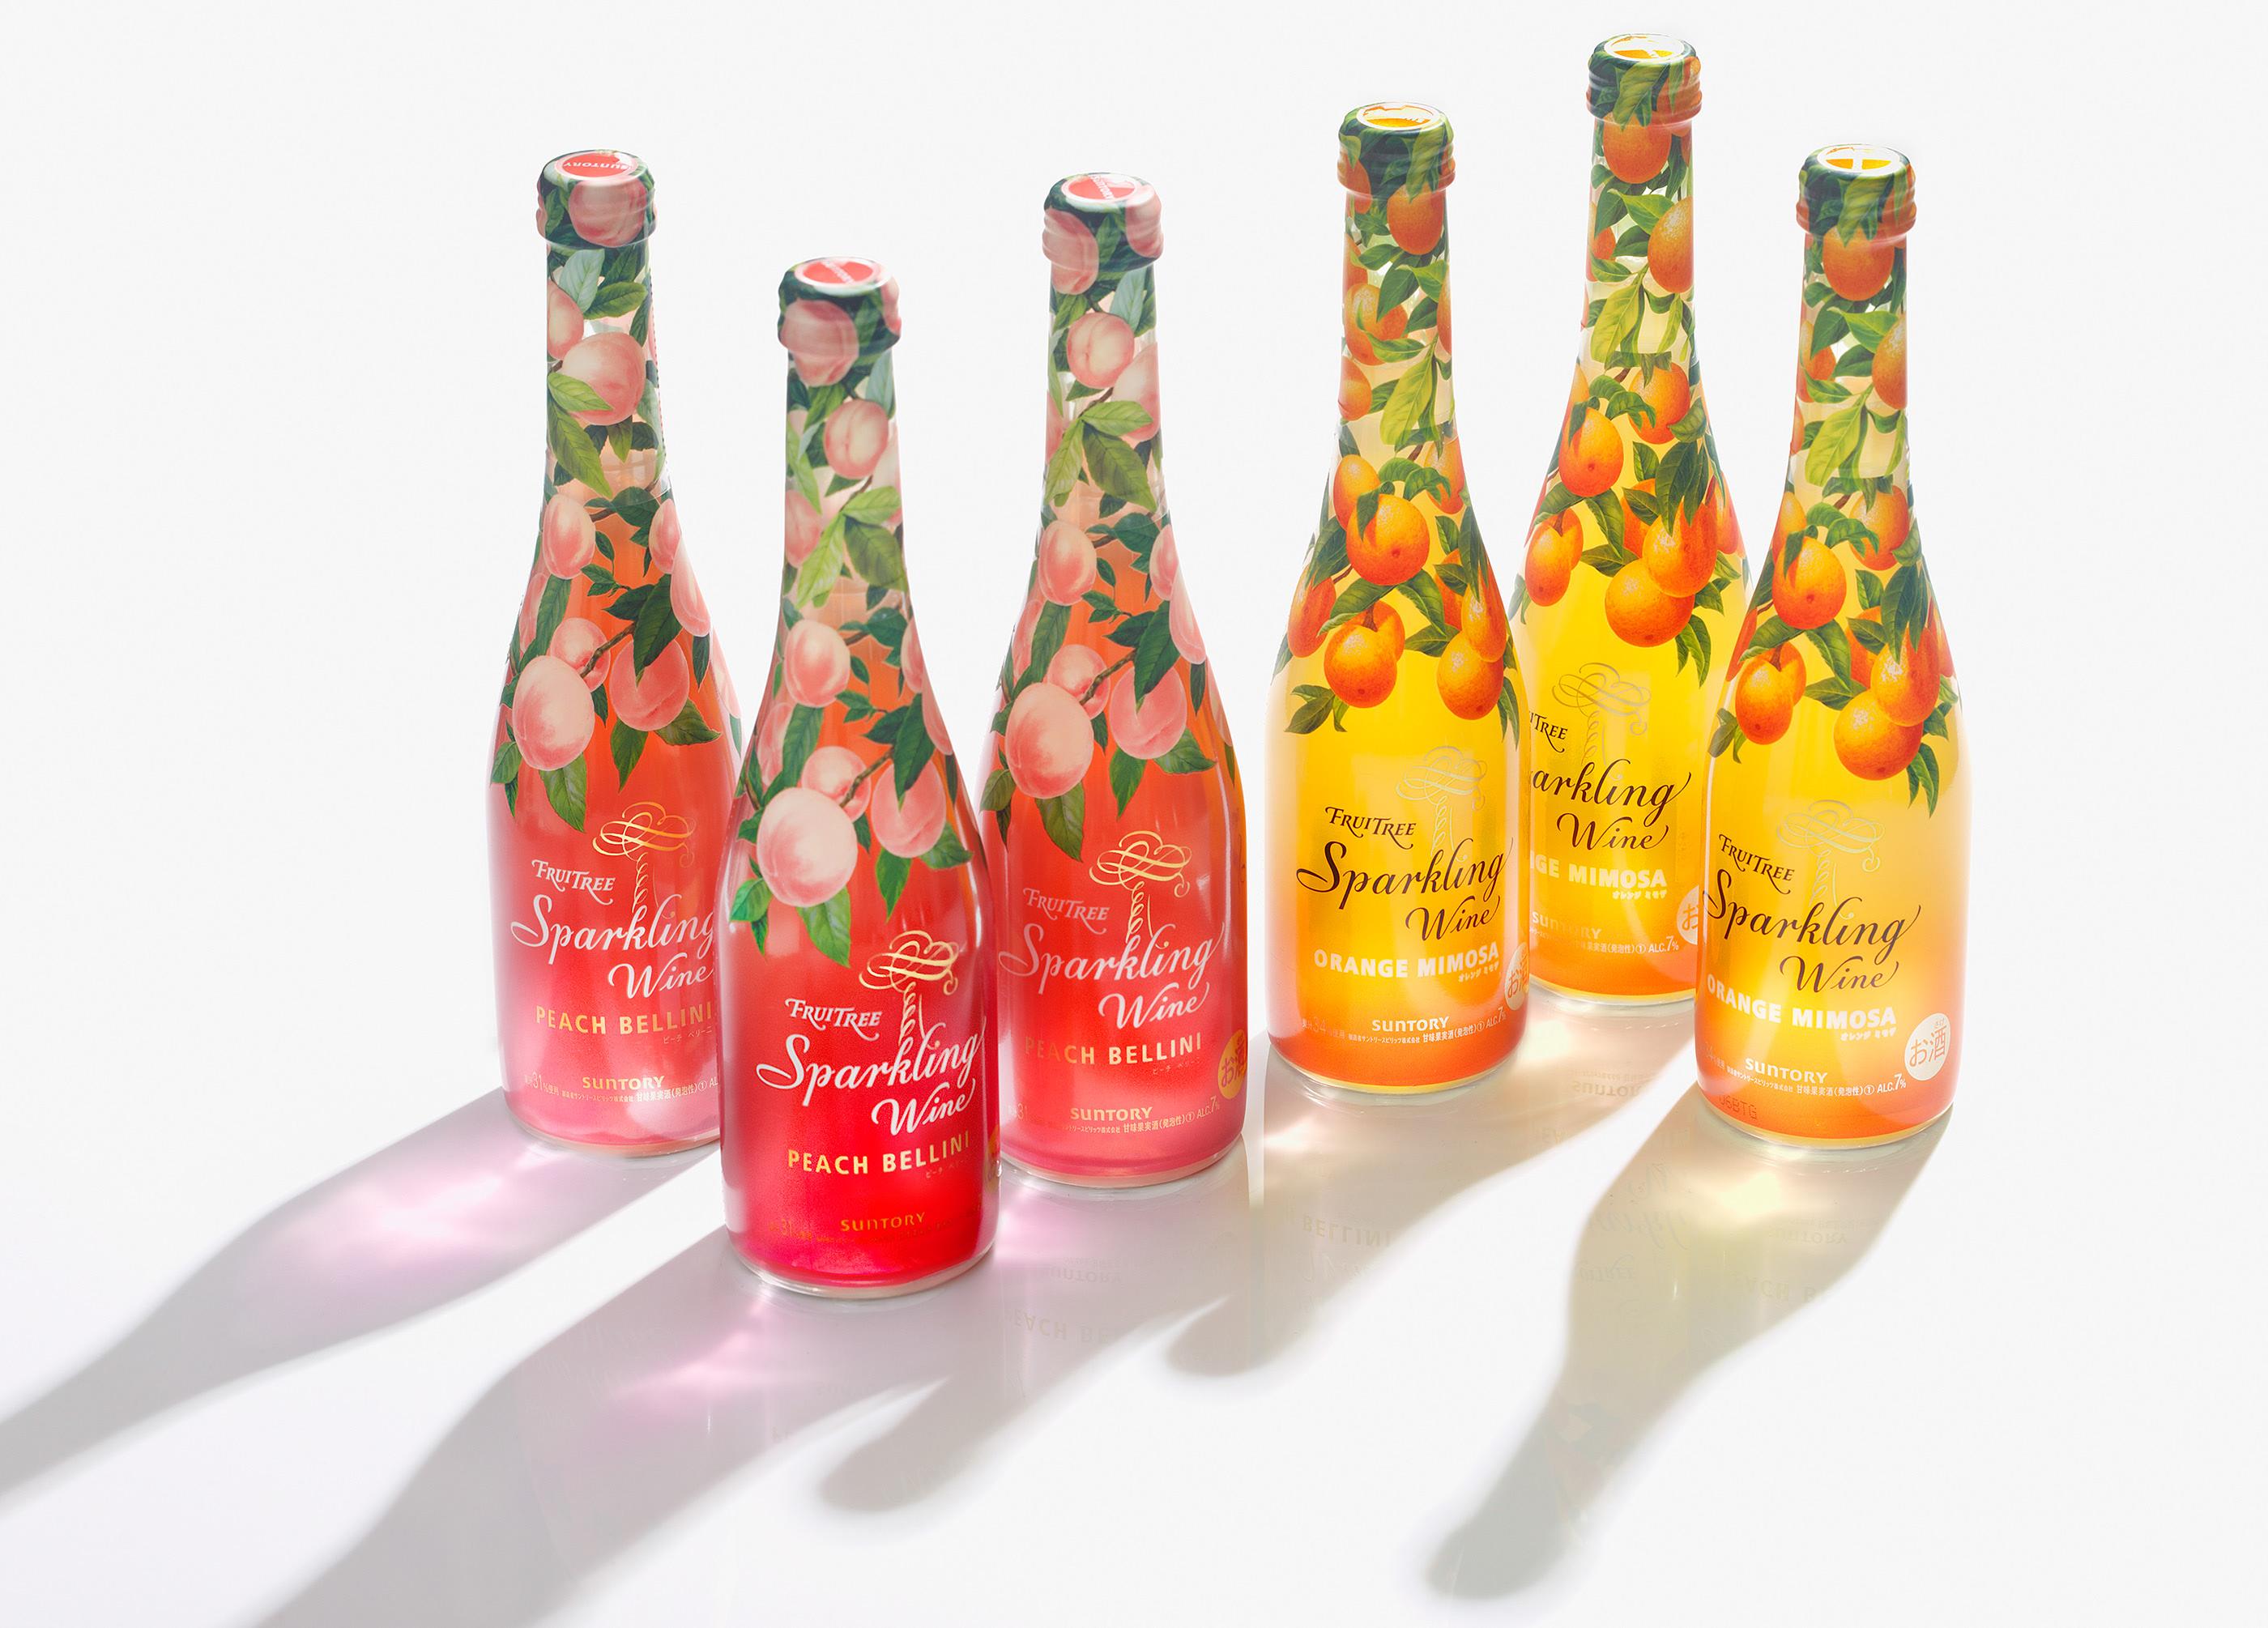 Fruittree Sparkling Wine Packaging Design by Yuko Takagi